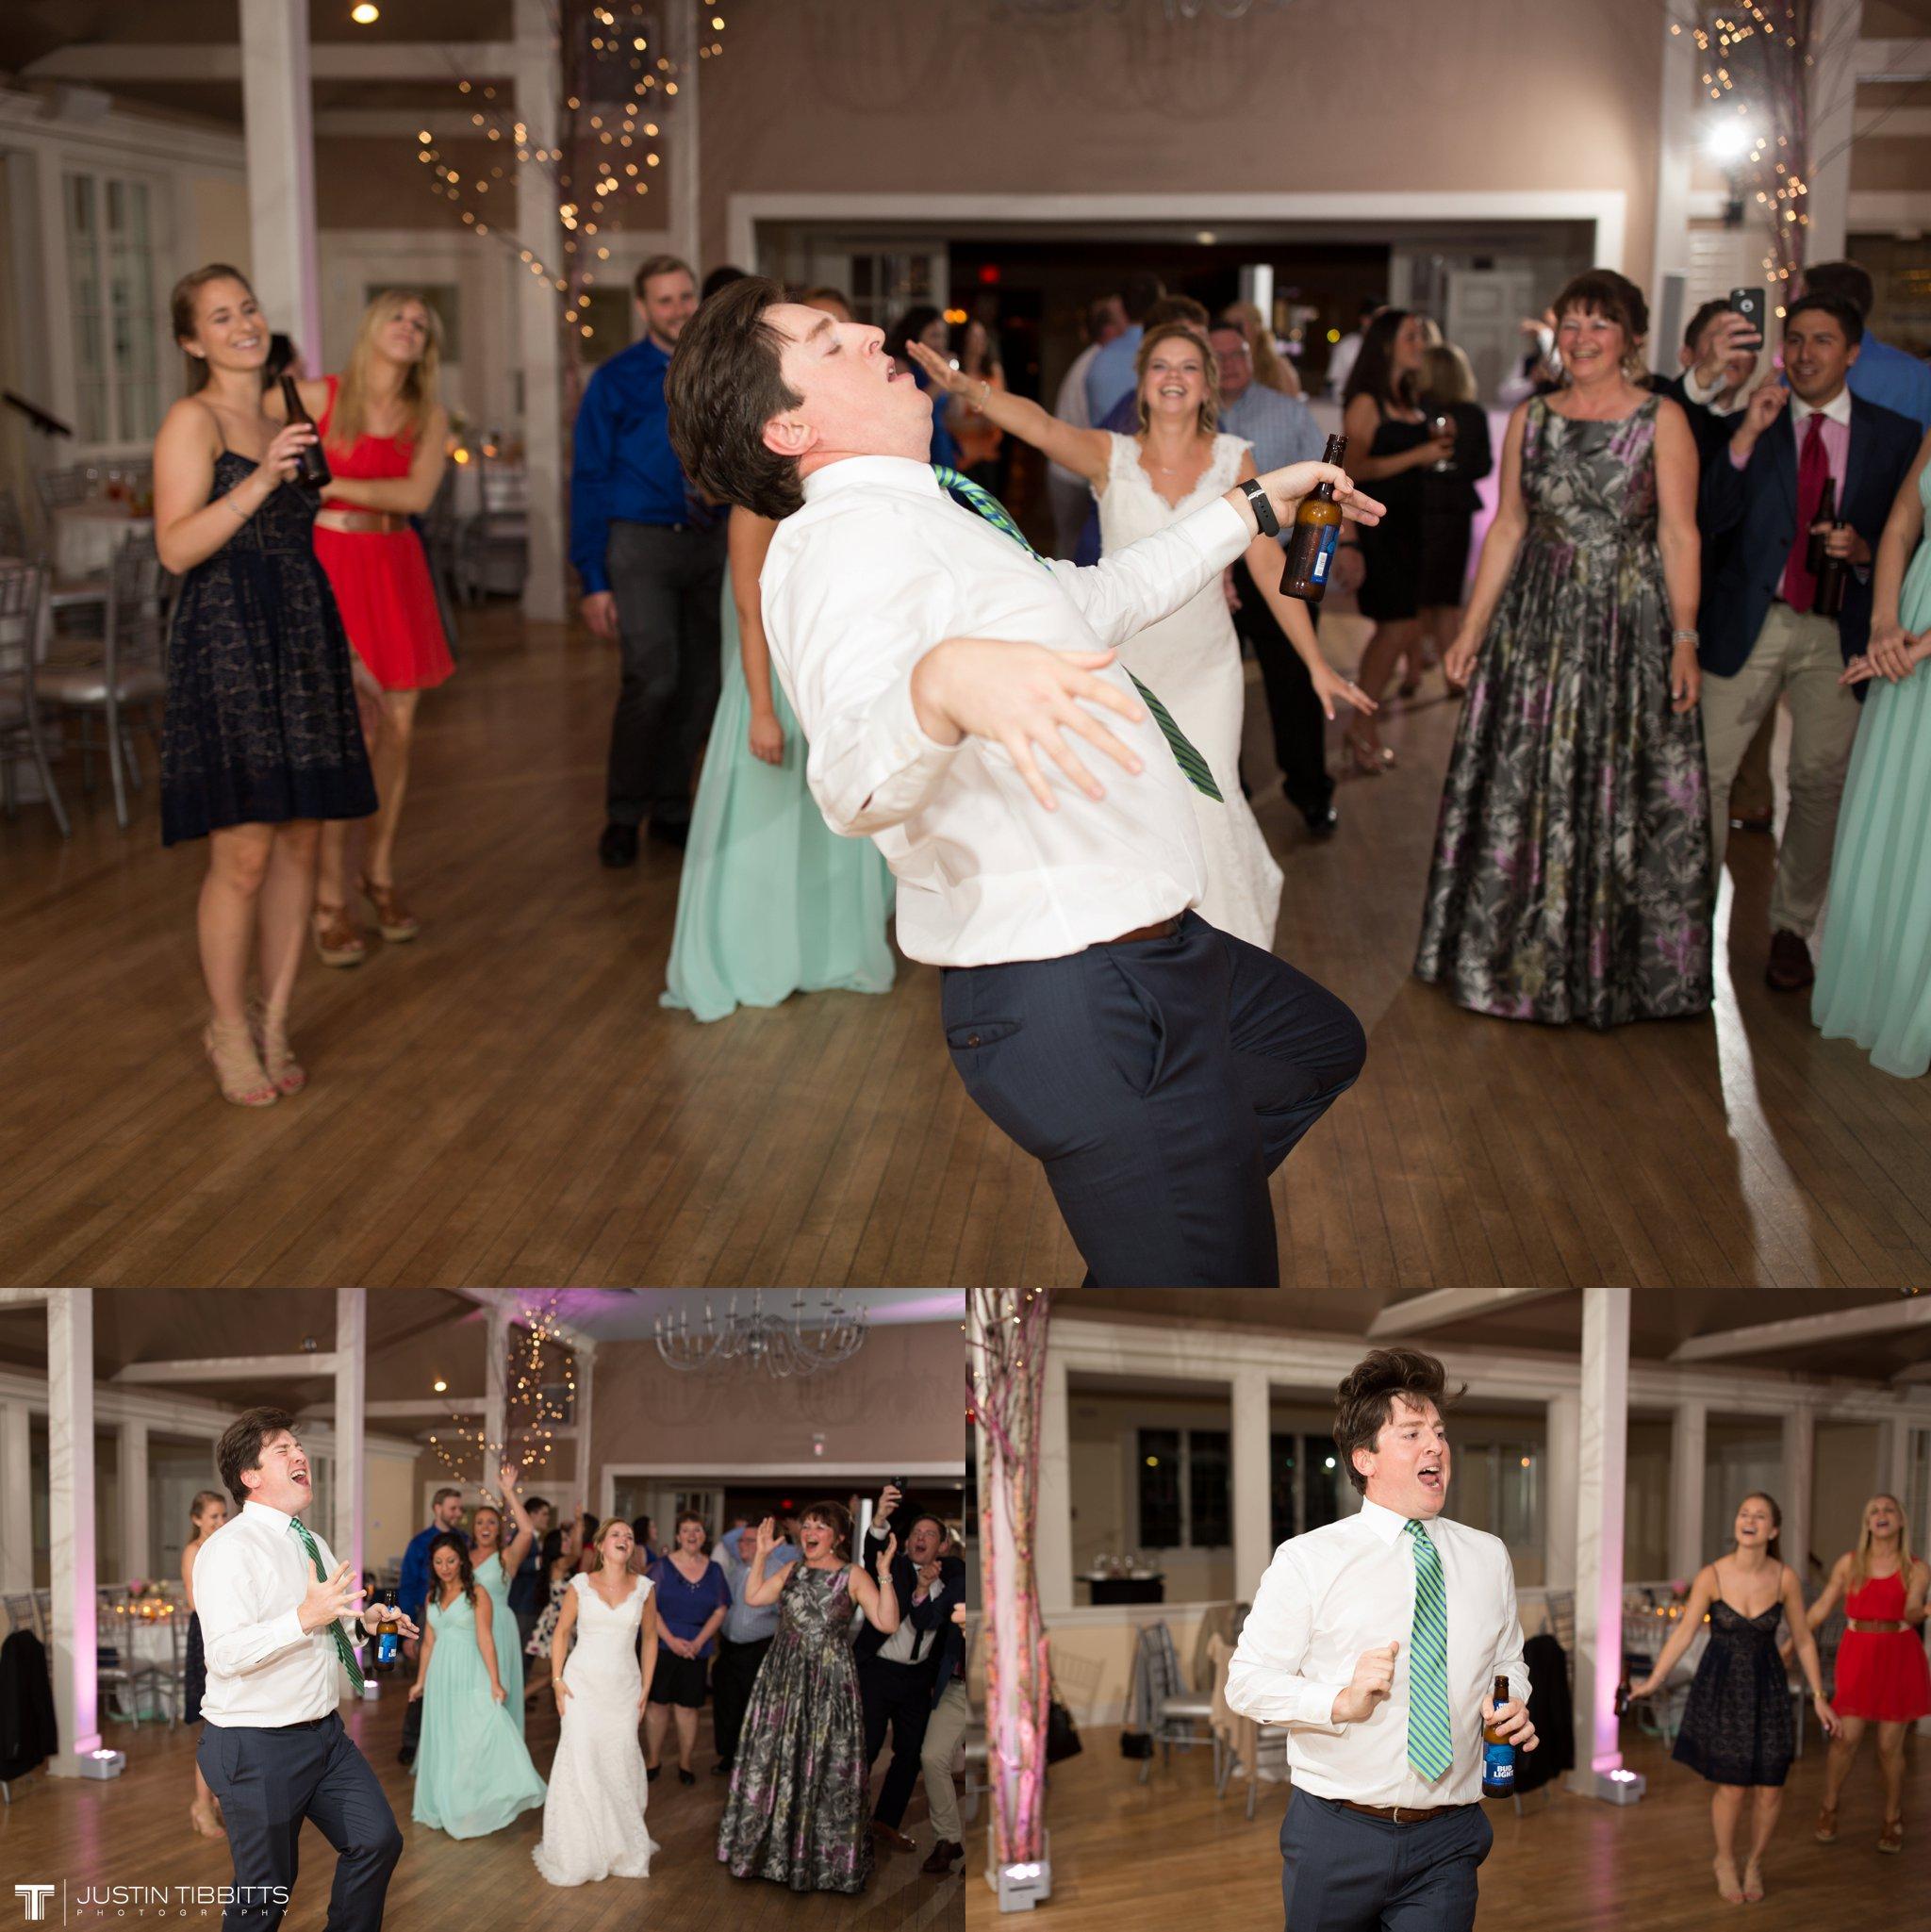 crooked-lake-house-wedding-photos-with-agata-and-seth_0143